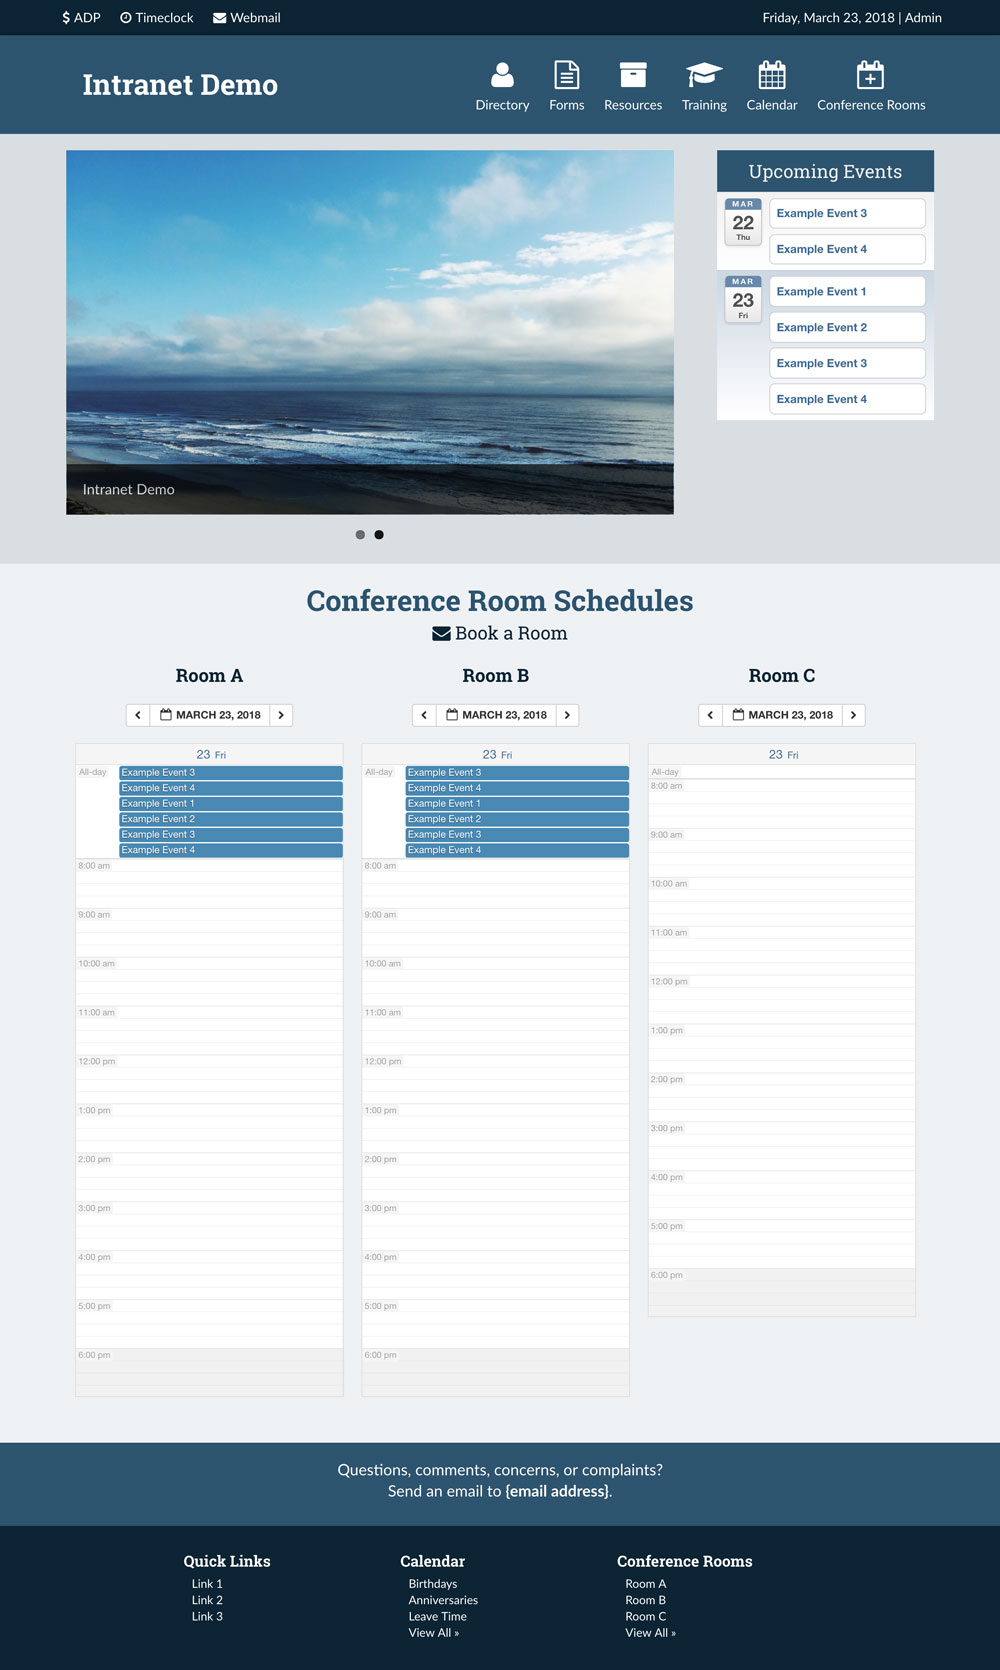 Screenshot of intranet demo